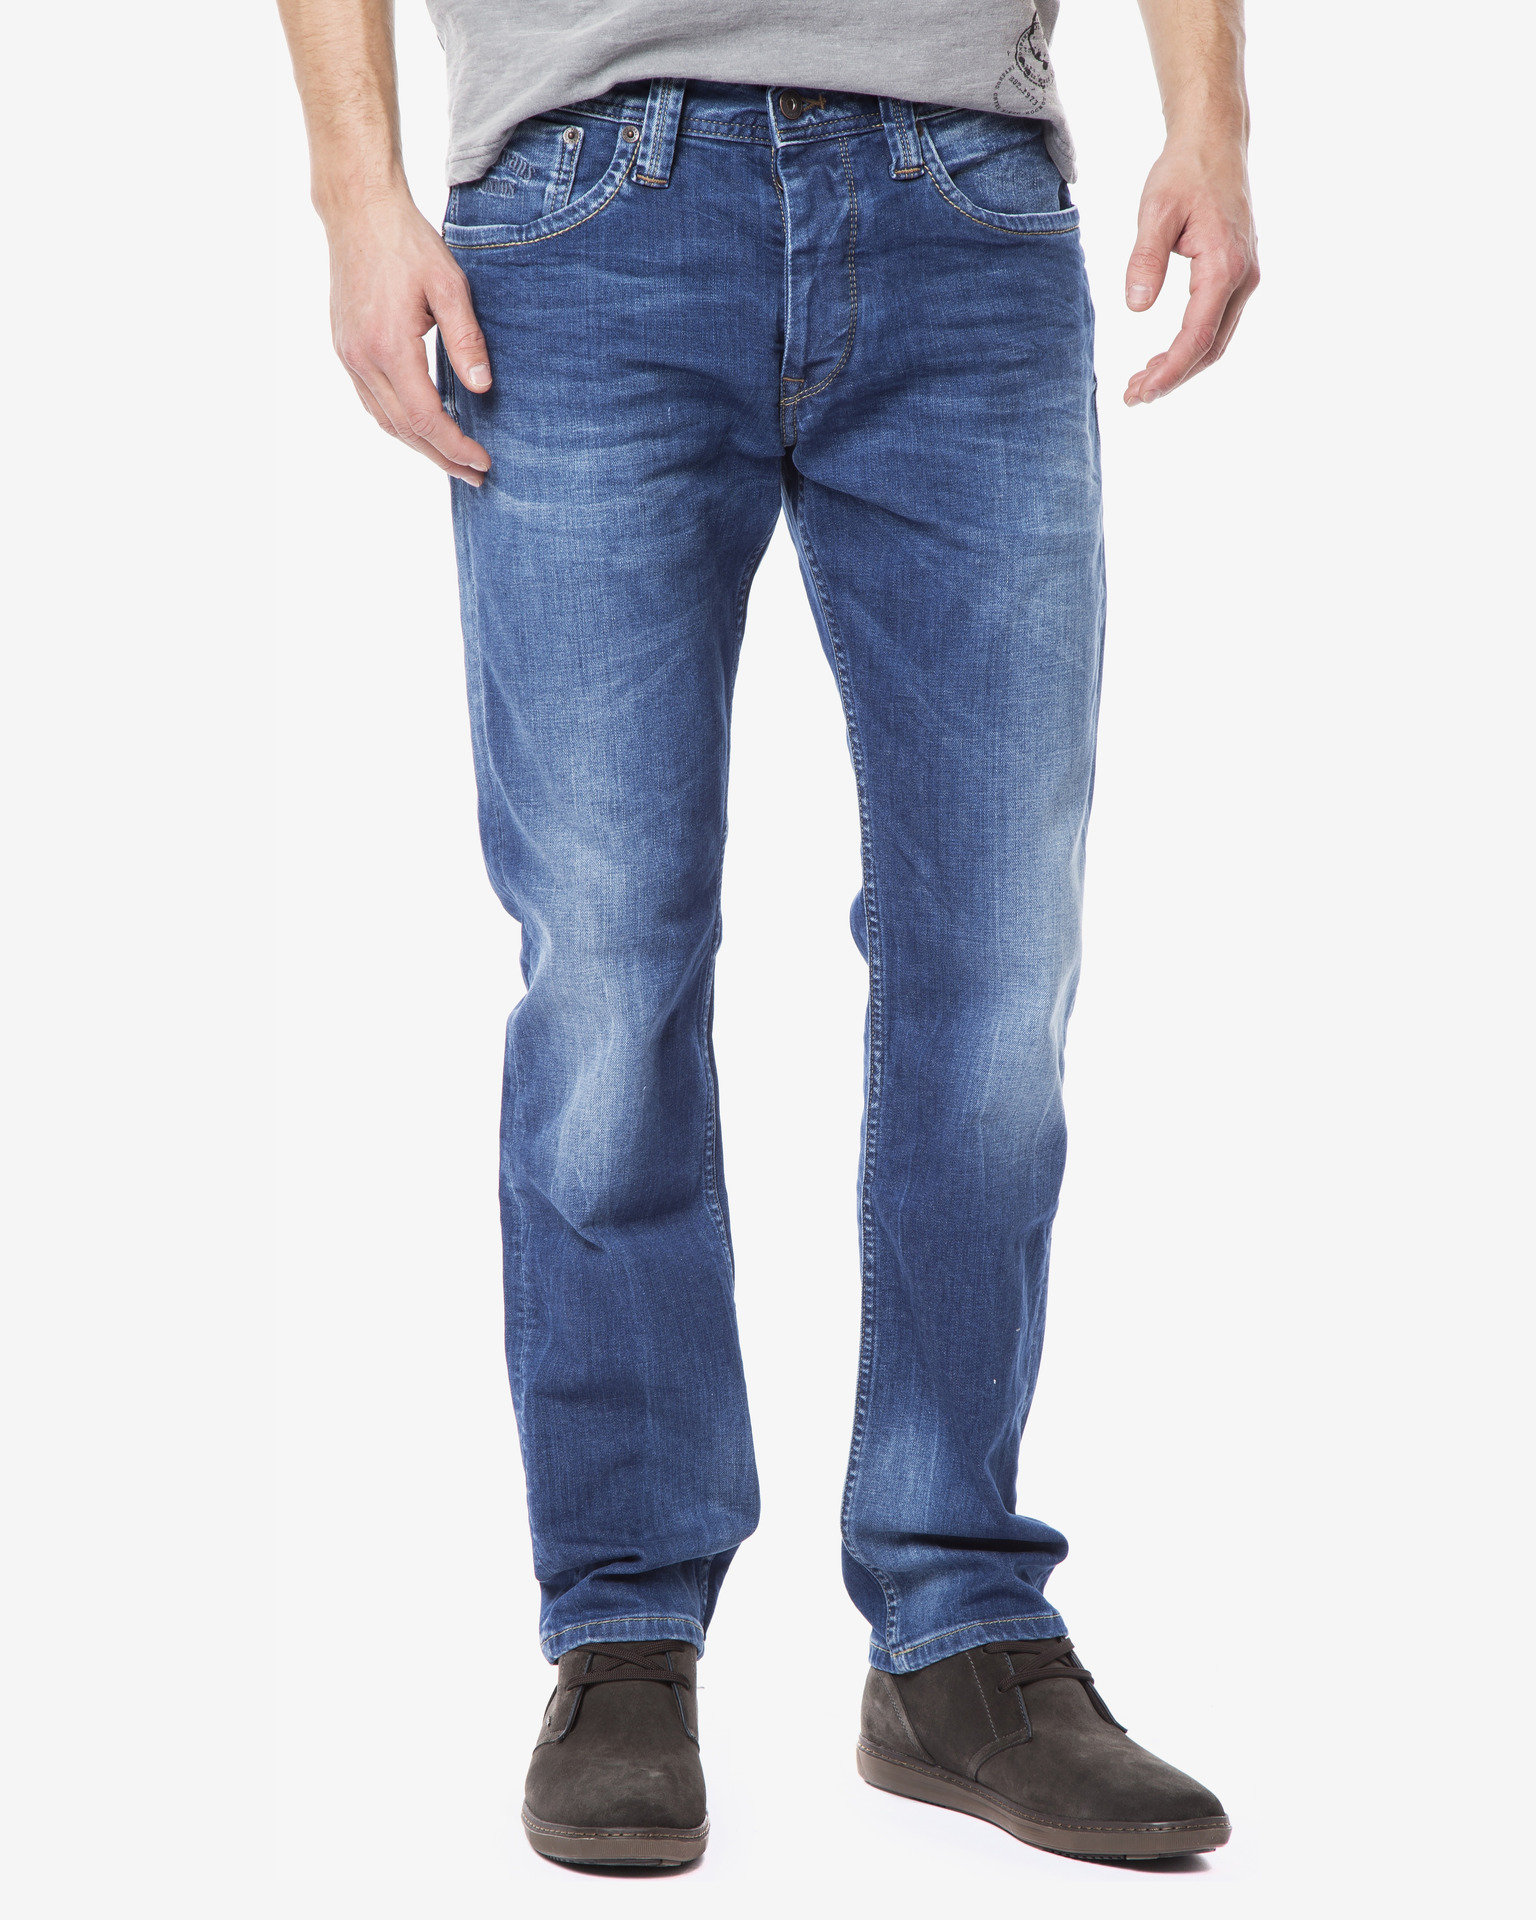 später Herbst Schuhe Preis Pepe Jeans - Cash Jeans Bibloo.com